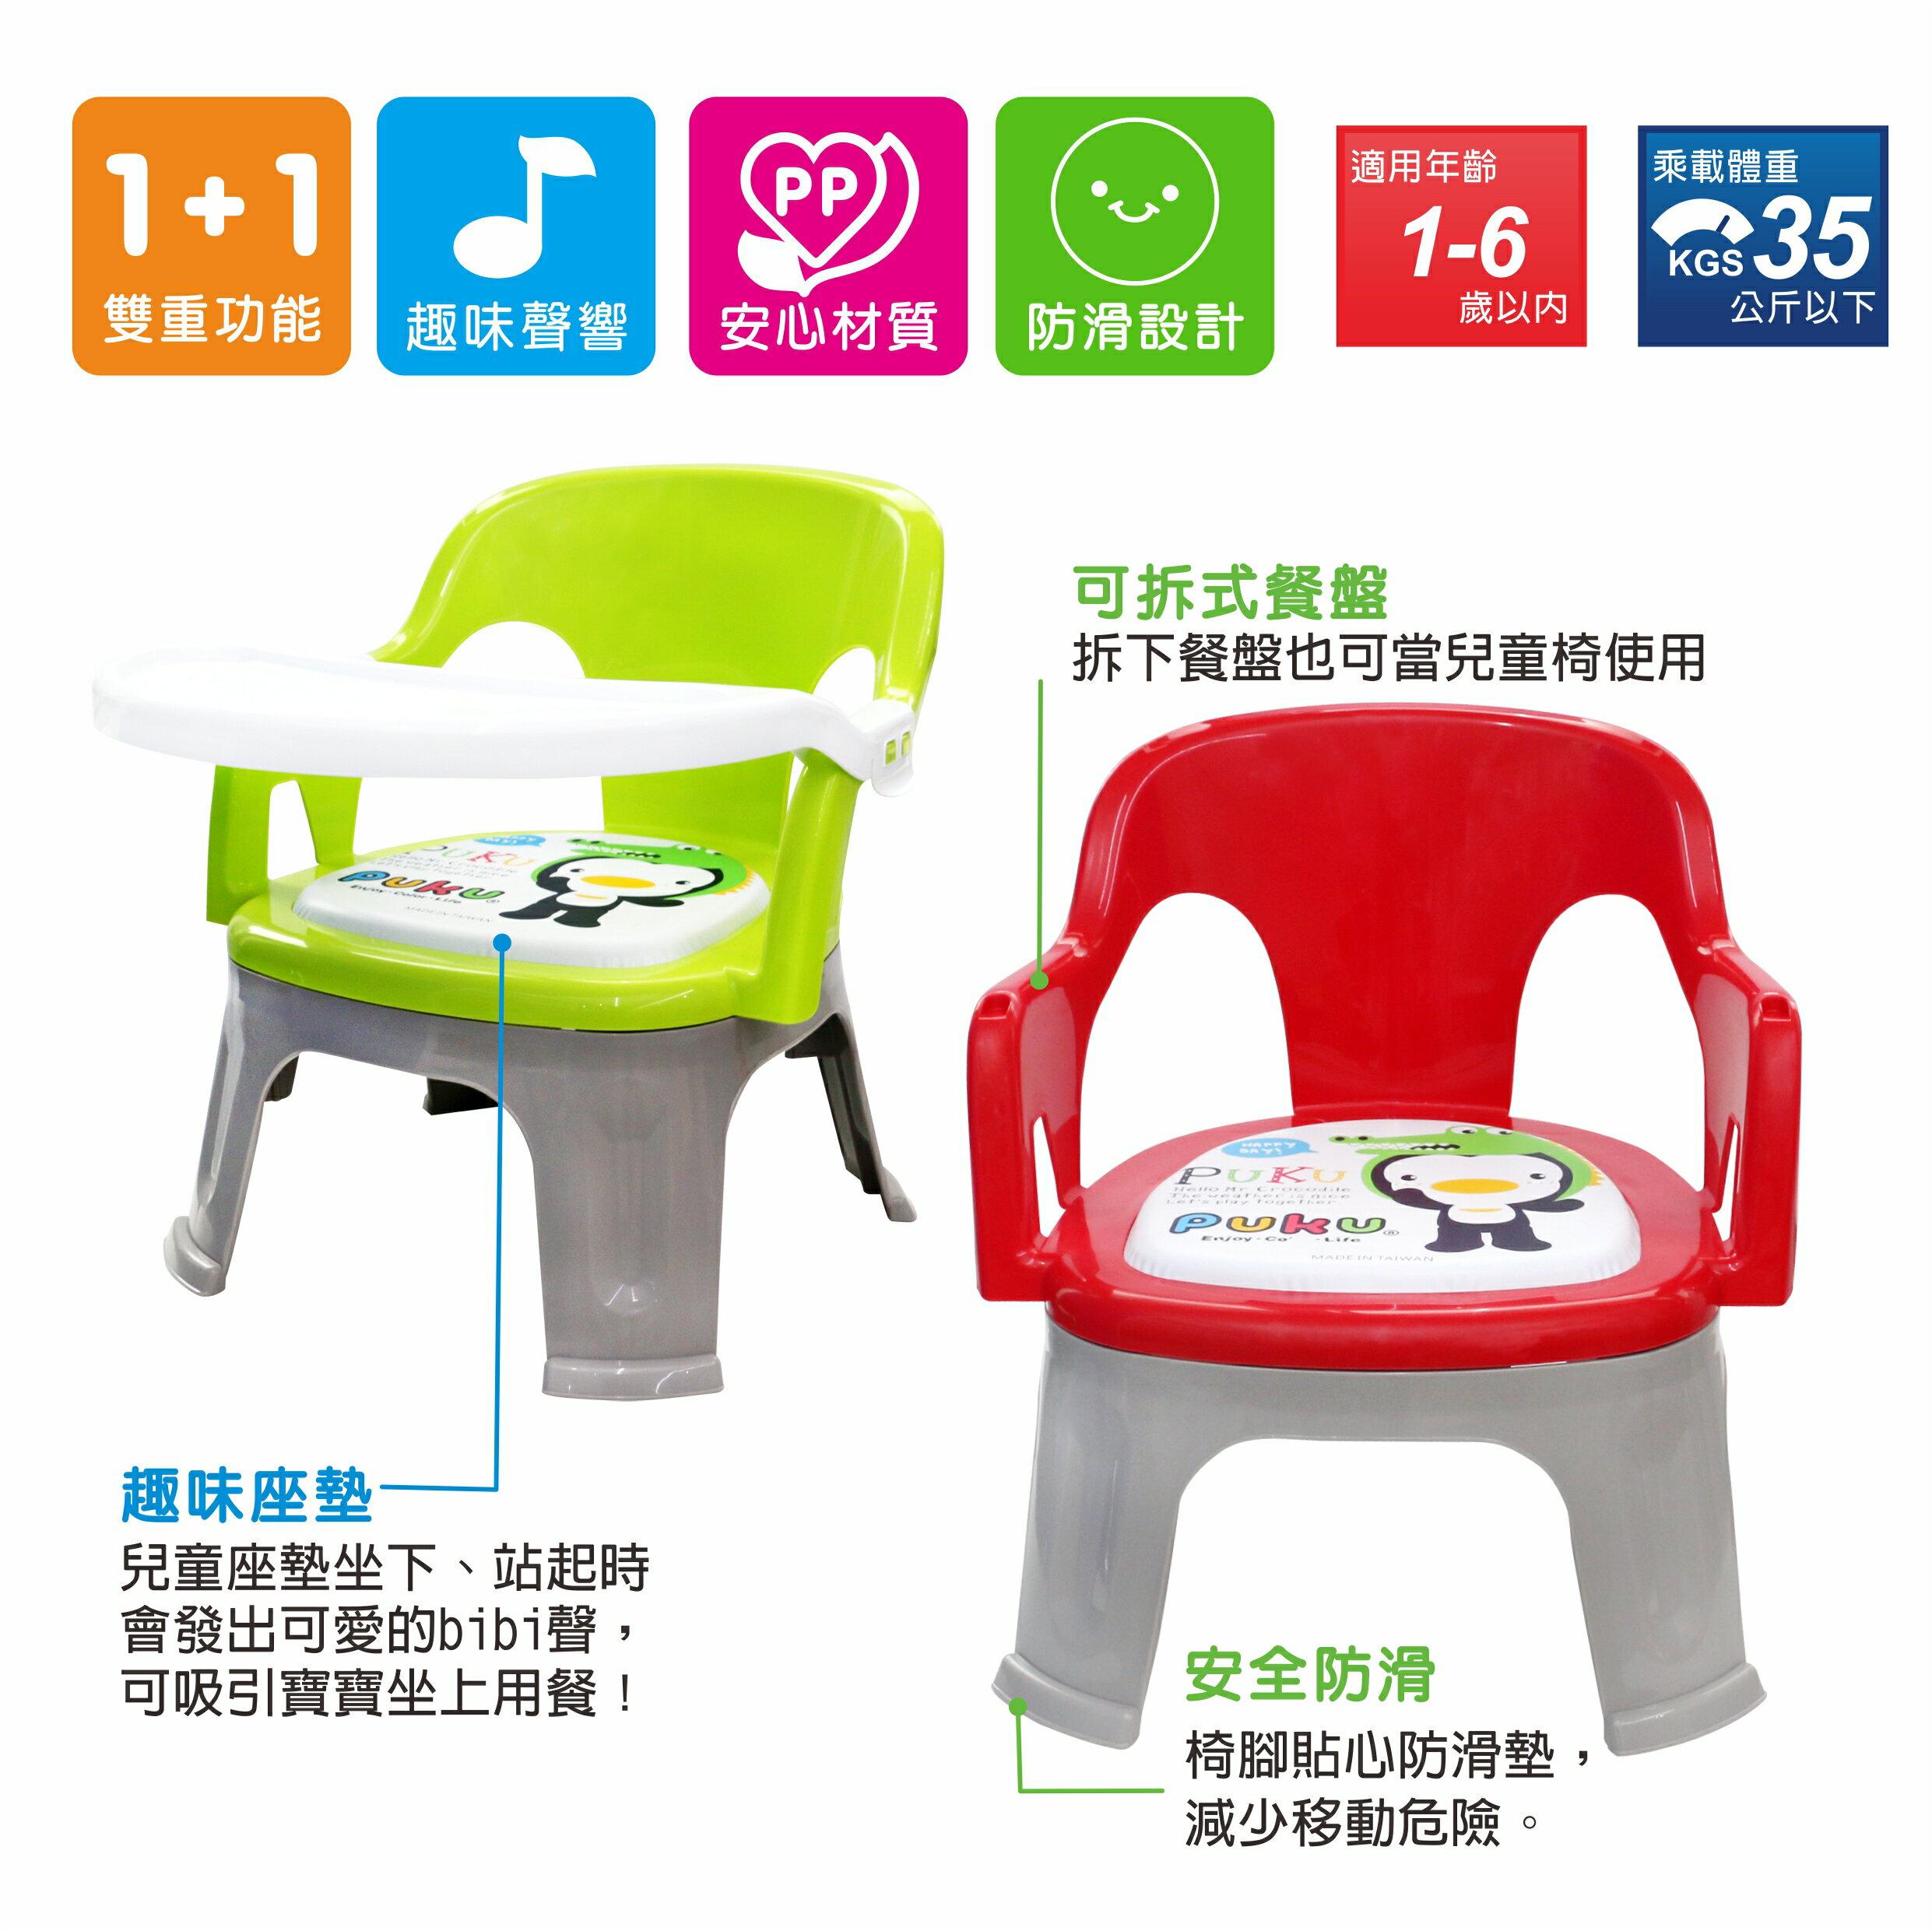 『121婦嬰用品館』PUKU Crocodile小鱷魚餐盤BB椅 - 紅 3